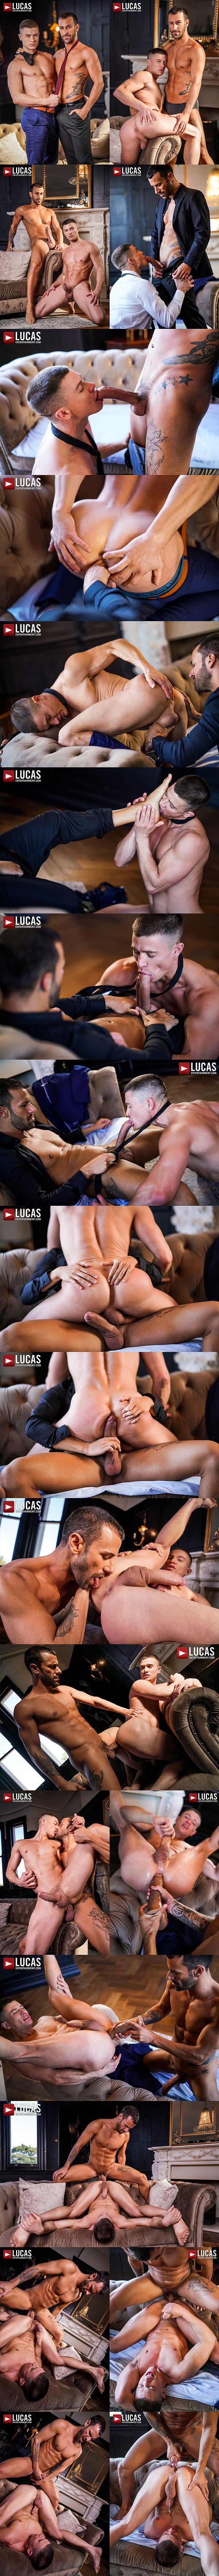 Lucasentertainment - rugged handsome Spanish porn star Gustavo Cruz barebacks and breeds muscle jock Ruslan Angelo in Gentlemen 30 Sweating Some Overtime 02